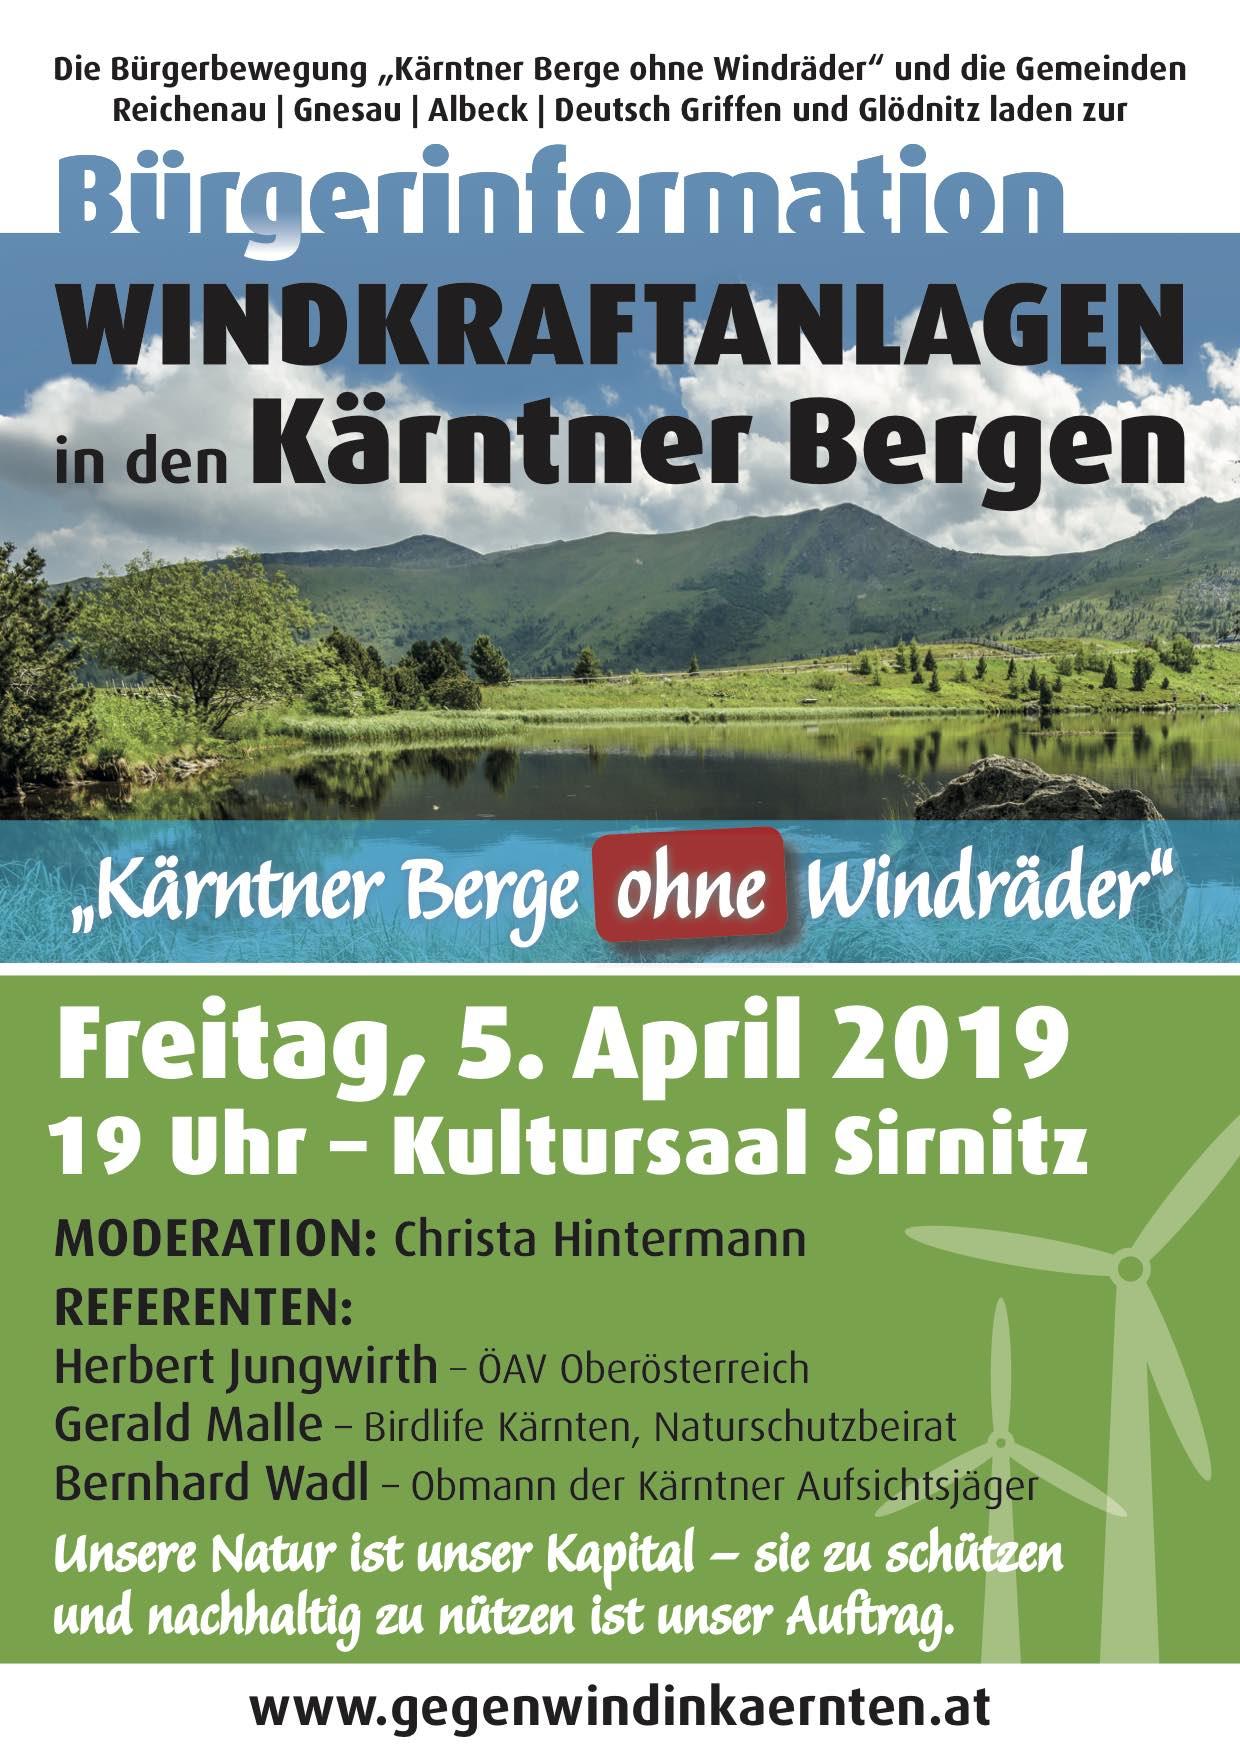 Windkraft_Nockberge_Sirnitz_aktualisiert